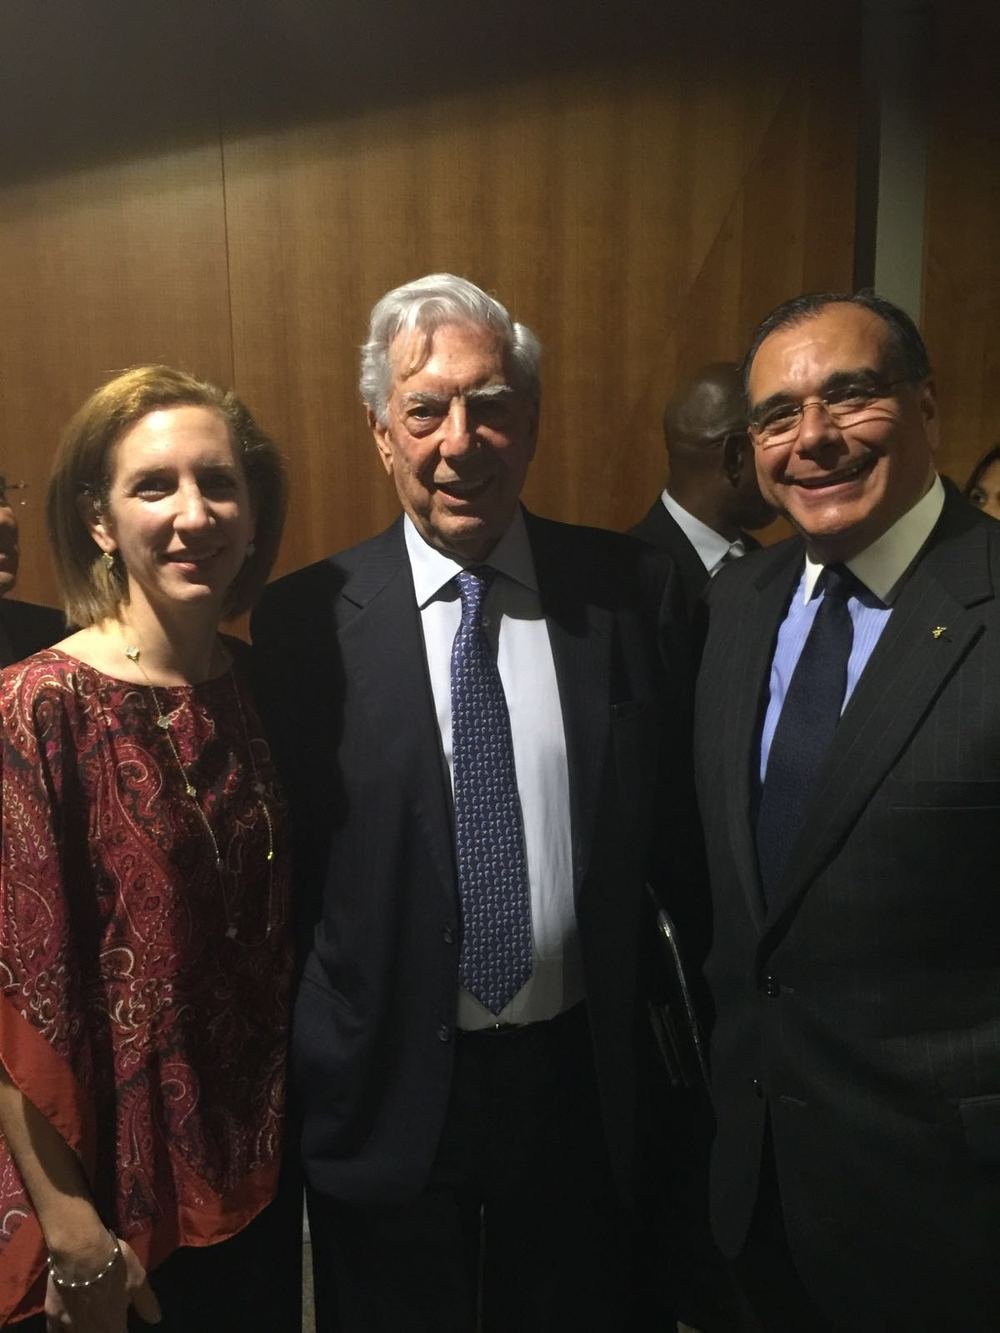 From left, Glorybell Daboub, Mario Vargas Llosa, and Dr. Juan José Daboub